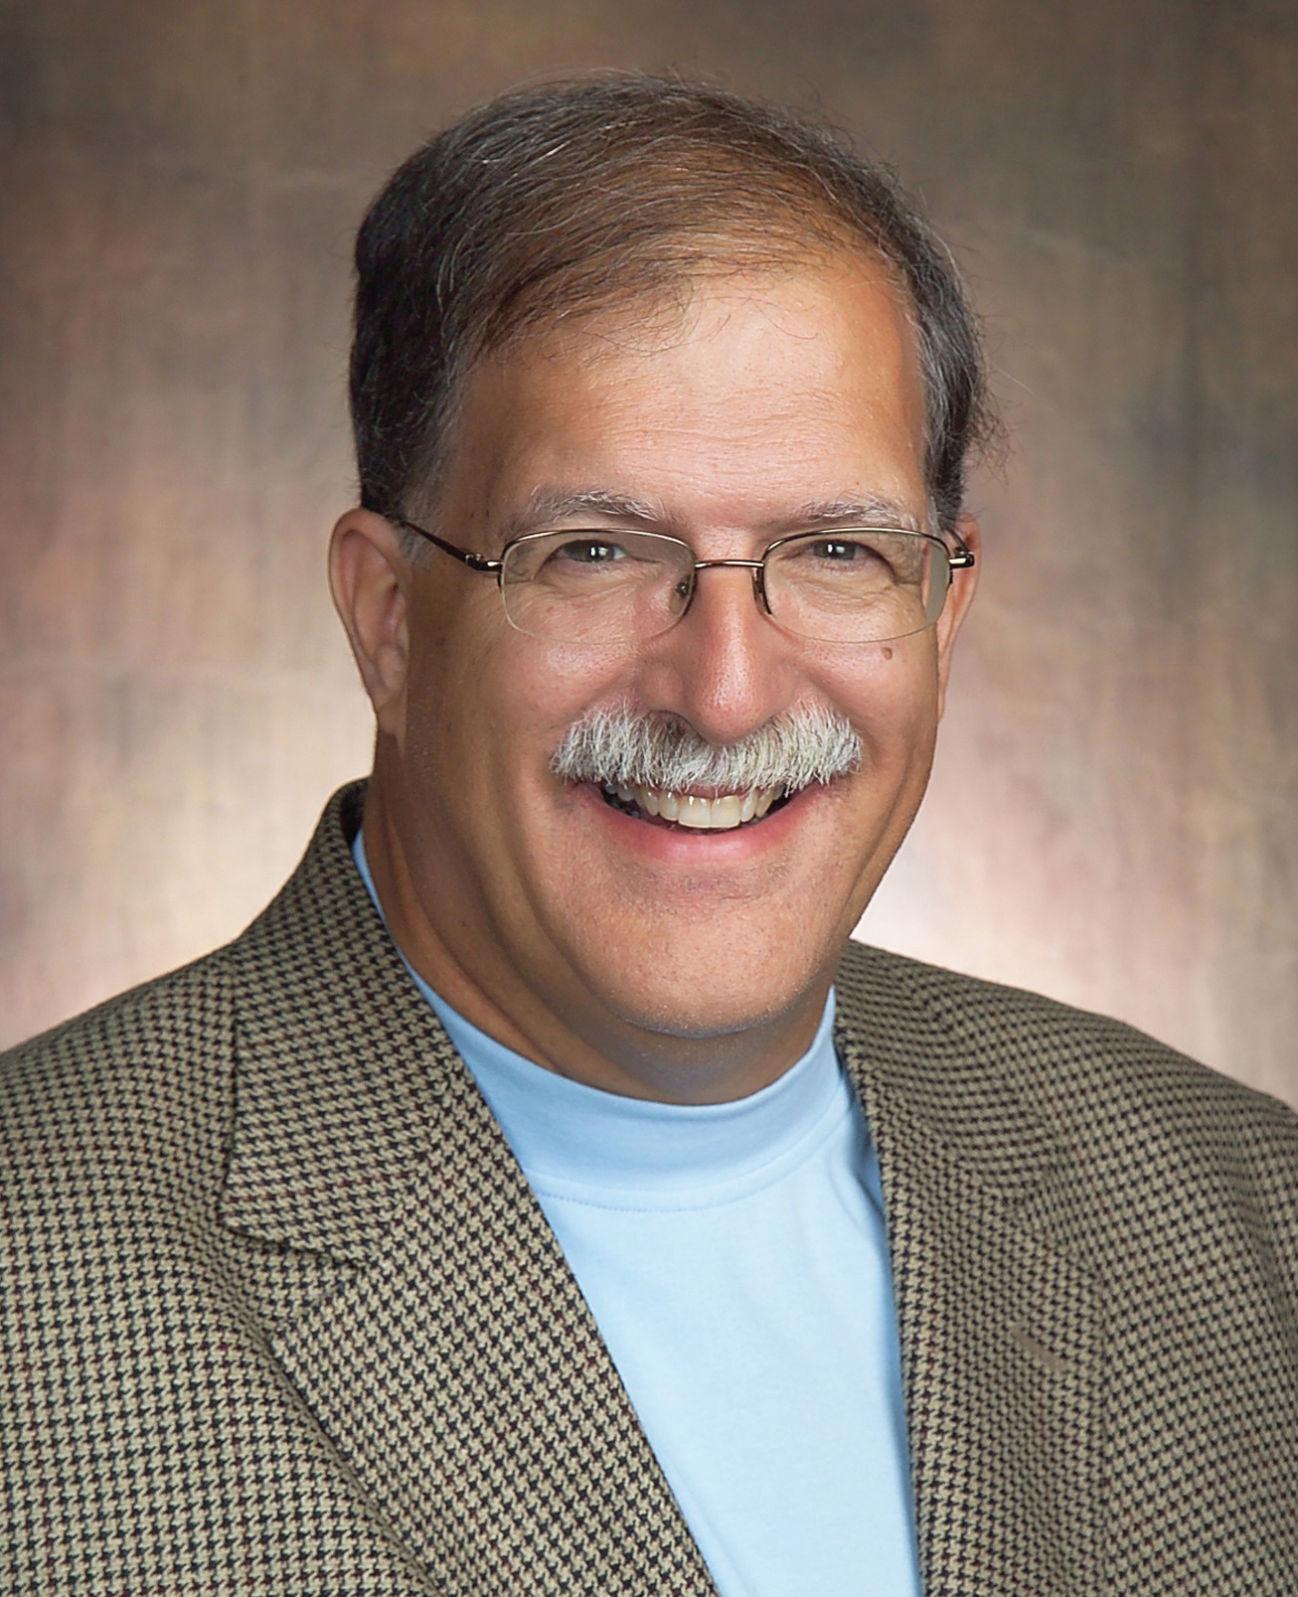 Steve Underdahl (Rice Co. commissioner) mug